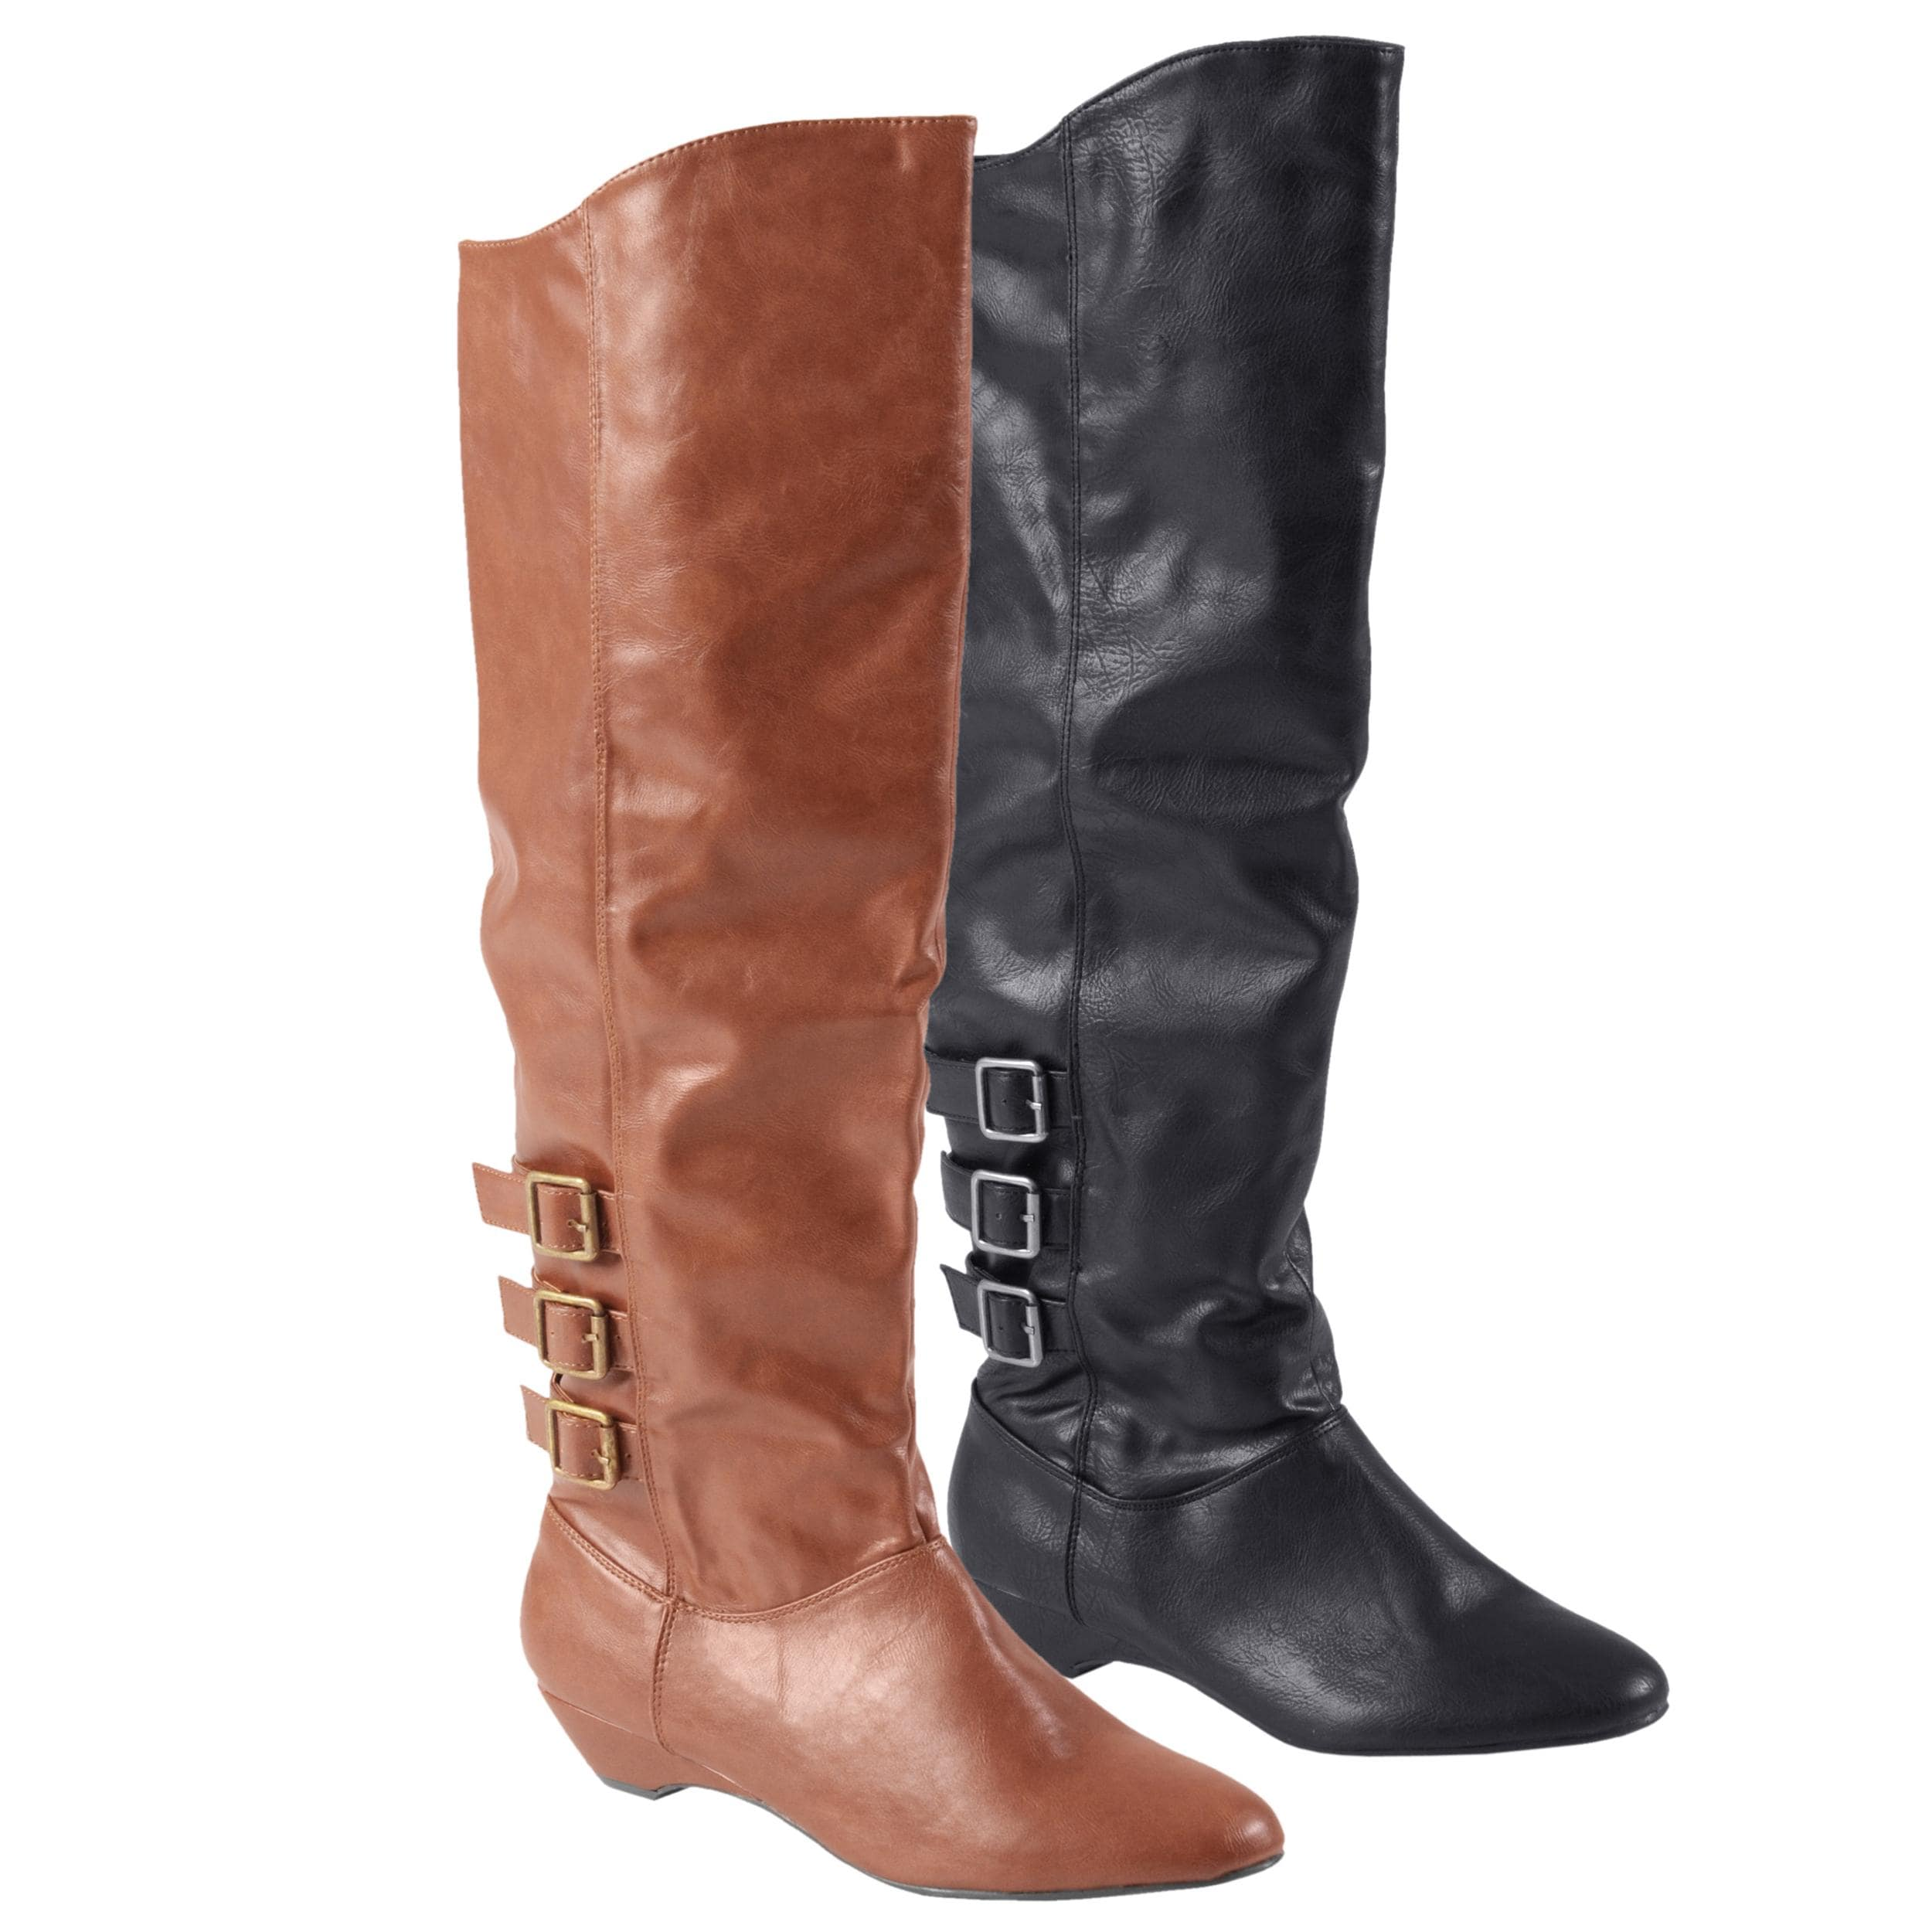 f4c3018d513 Shop Madden Girl by Steve Madden Women s  Zextor  Tall Buckle Detail Boots  - Free Shipping Today - Overstock - 6209376